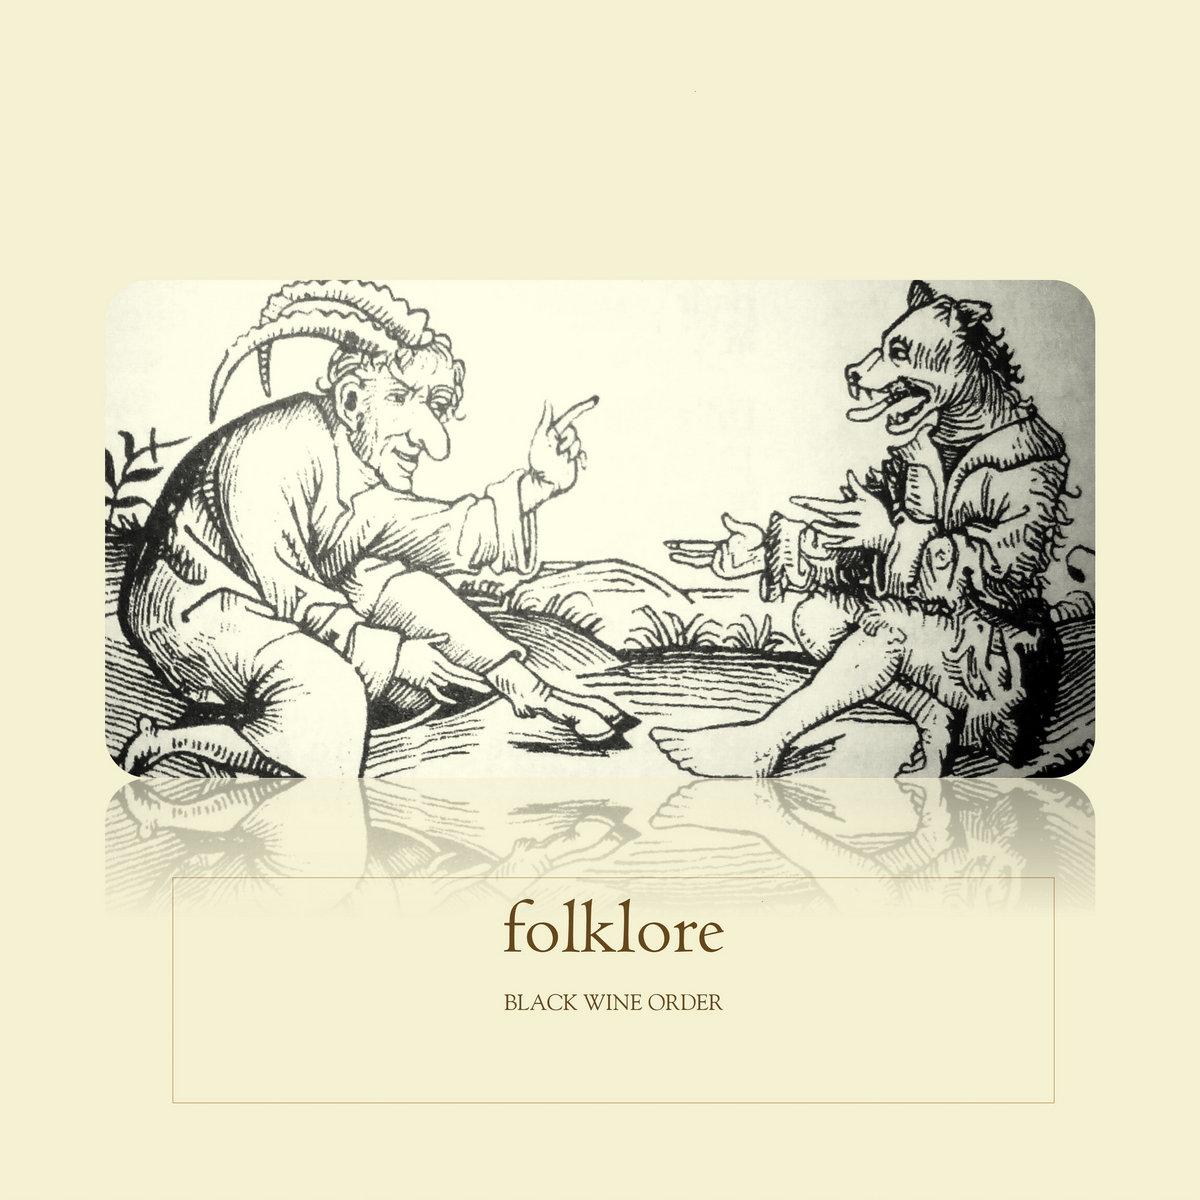 folklore black wine order